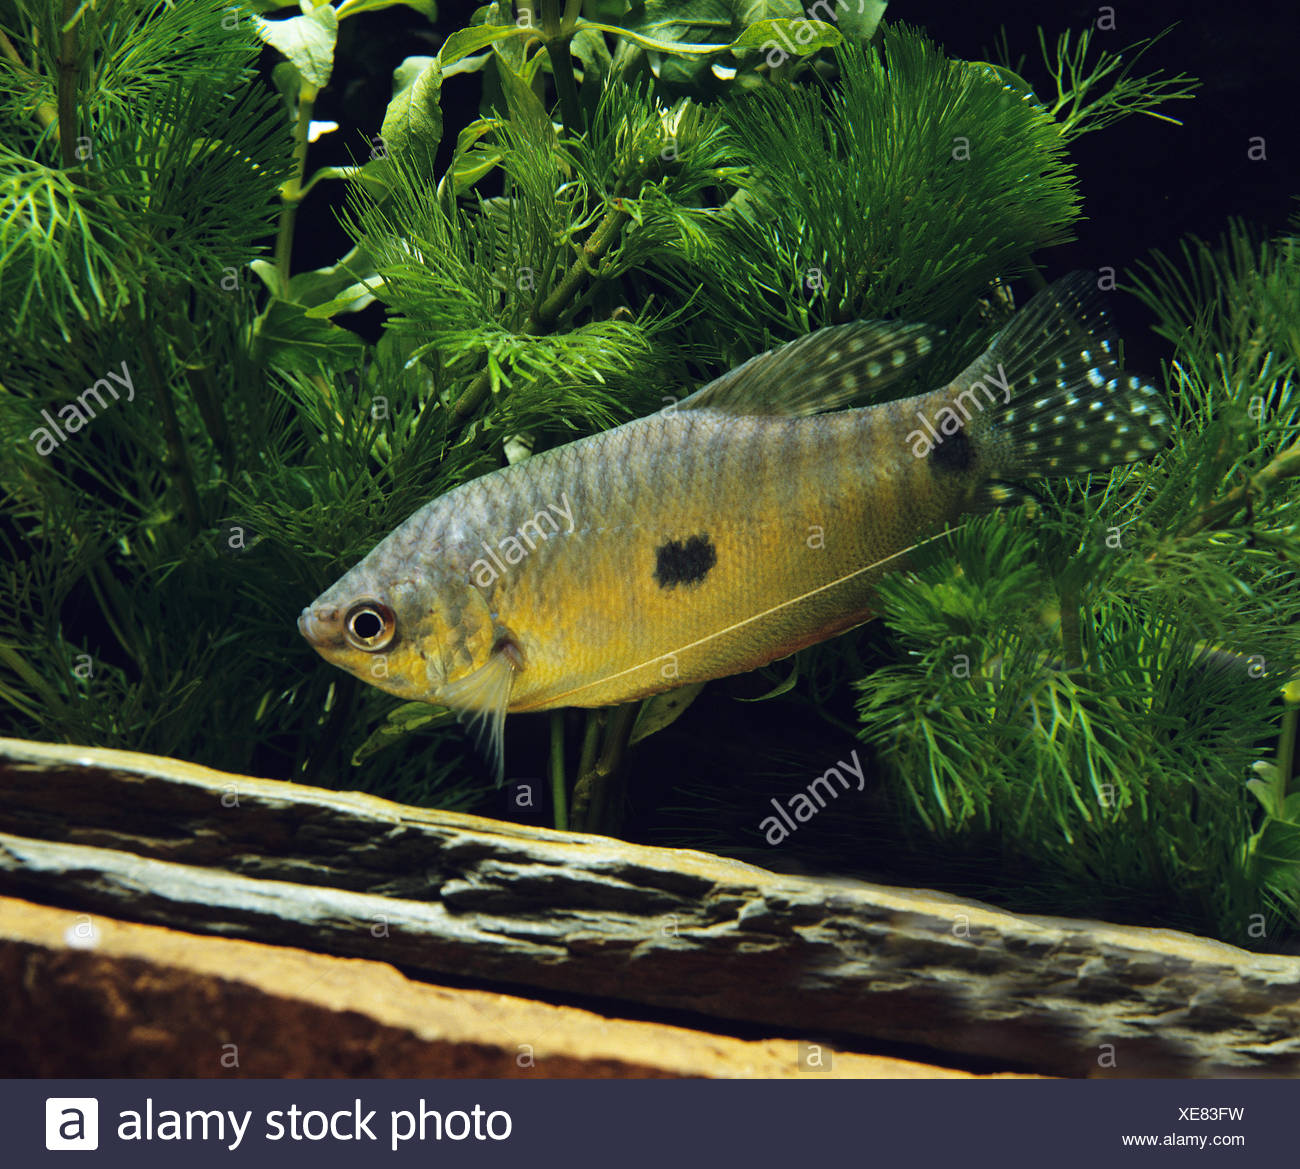 Gourami Fish, trichogaster trichopterus Stock Photo